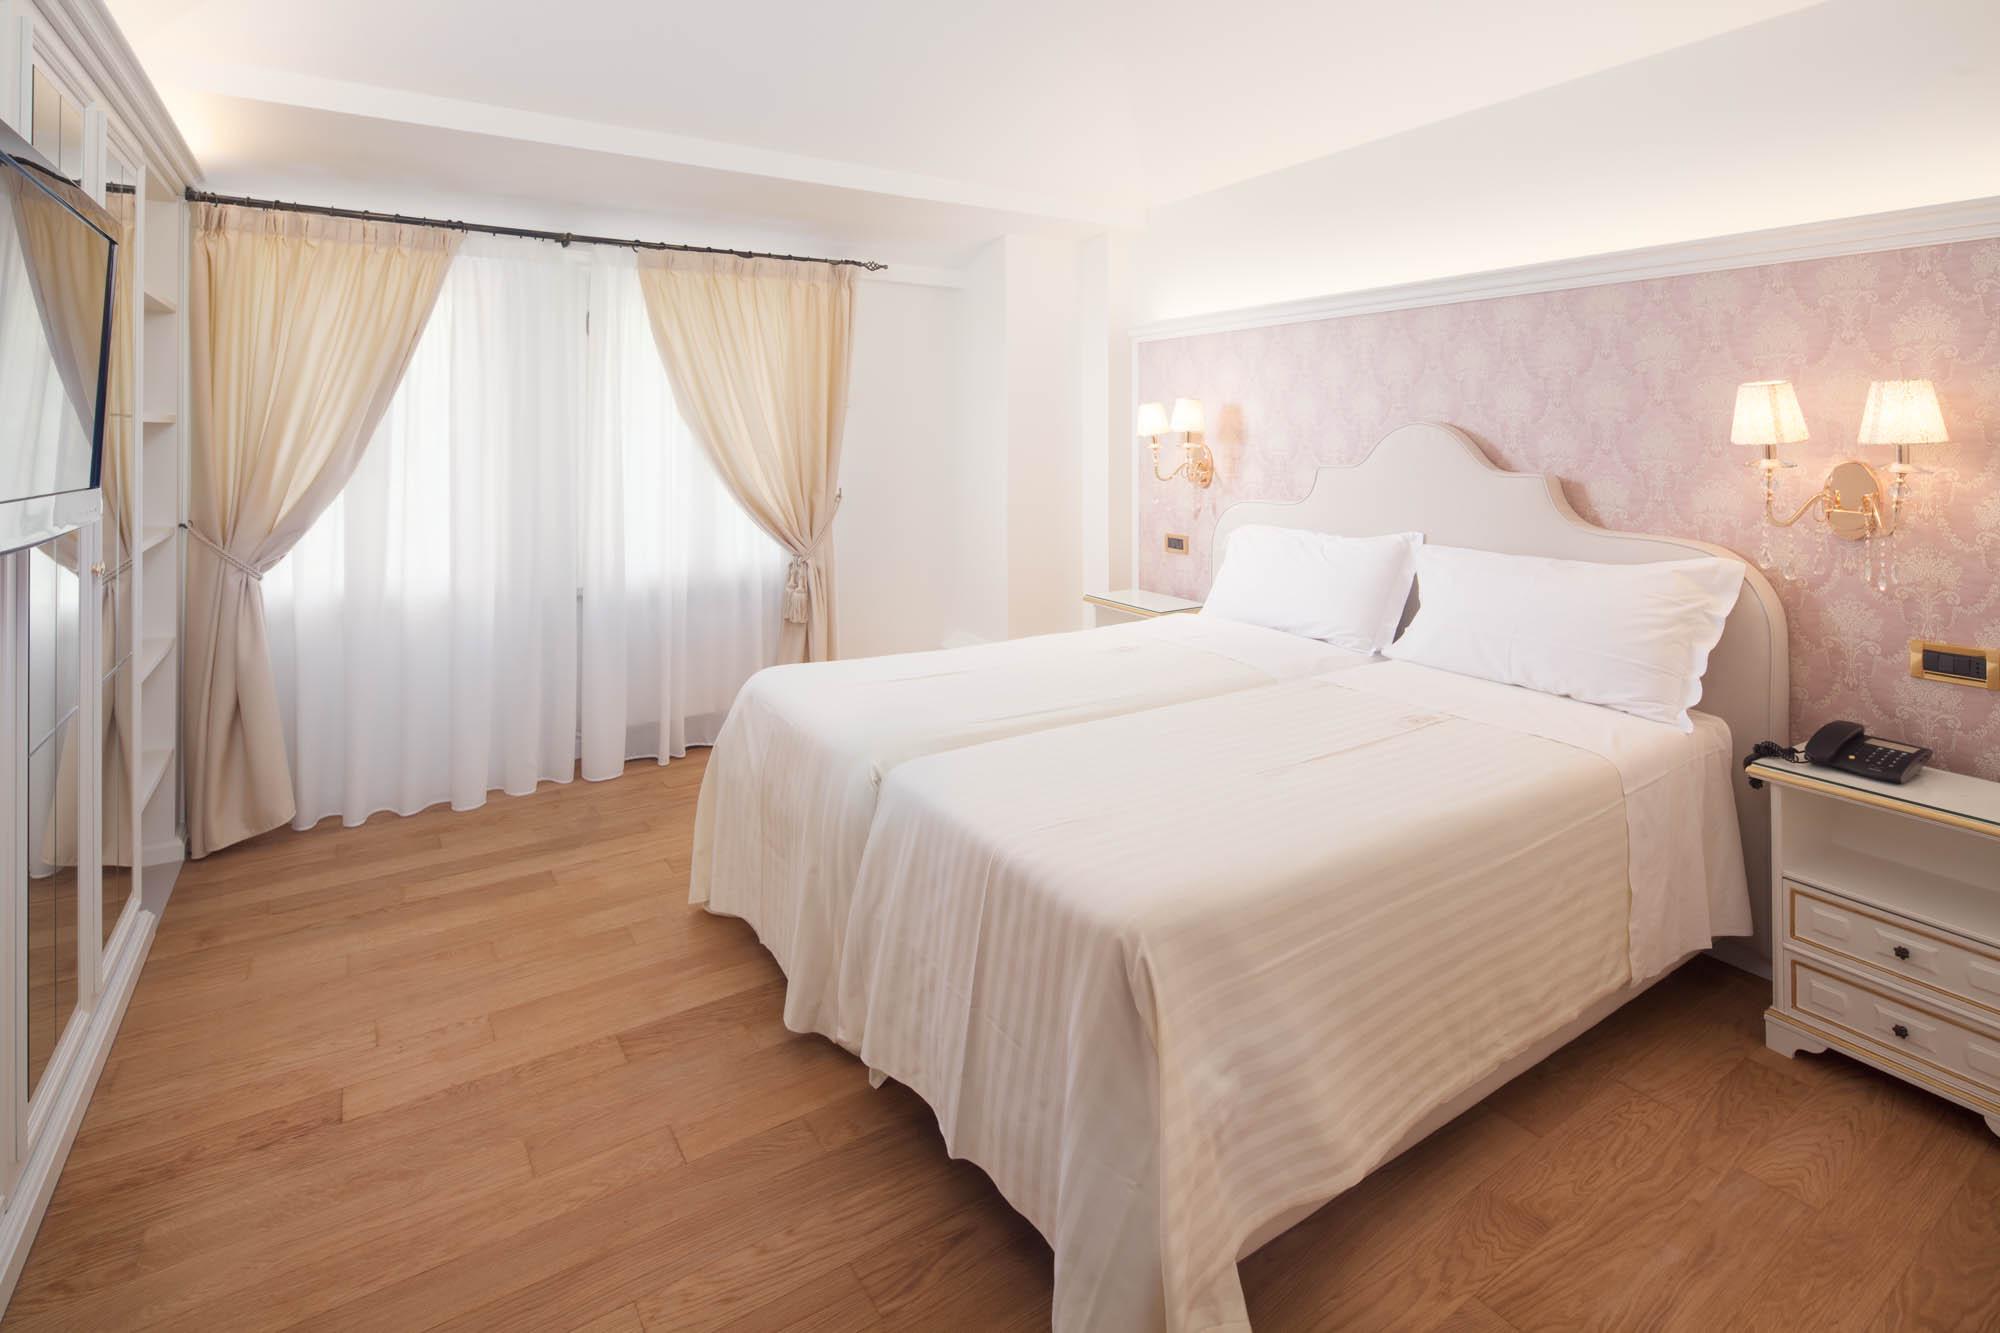 hotel-villa-condulmer-venezia-experience-italy4golf